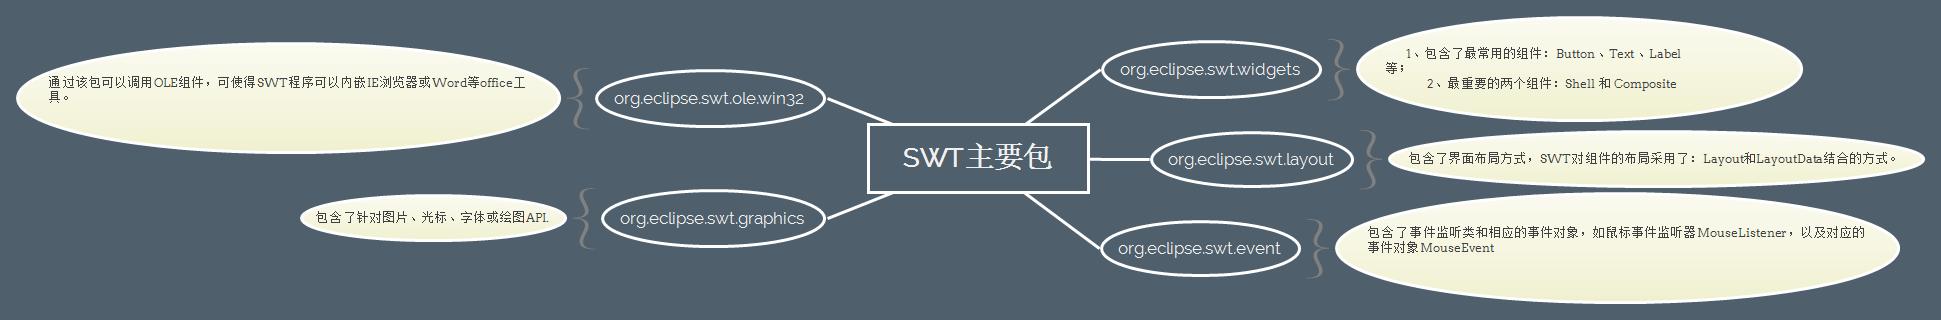 SWT主要包概述